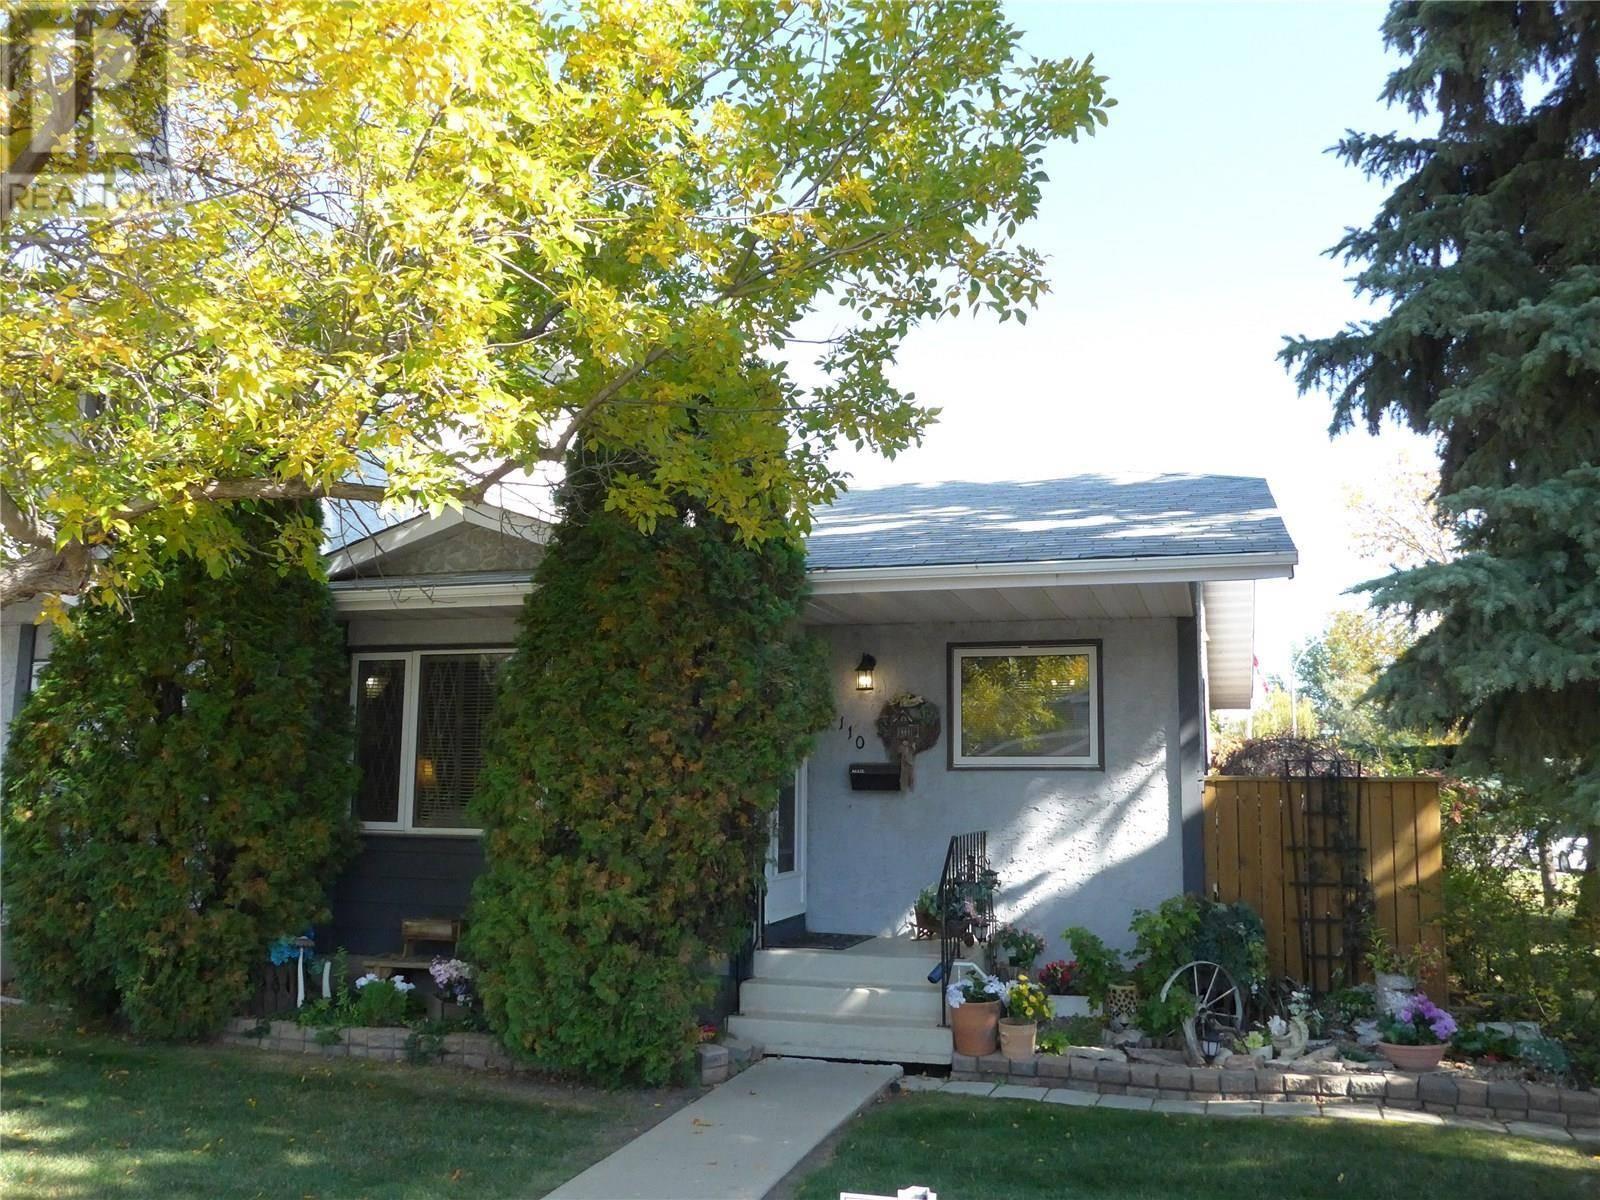 Townhouse for sale at 140 Meilicke Rd Unit 1110 Saskatoon Saskatchewan - MLS: SK787002